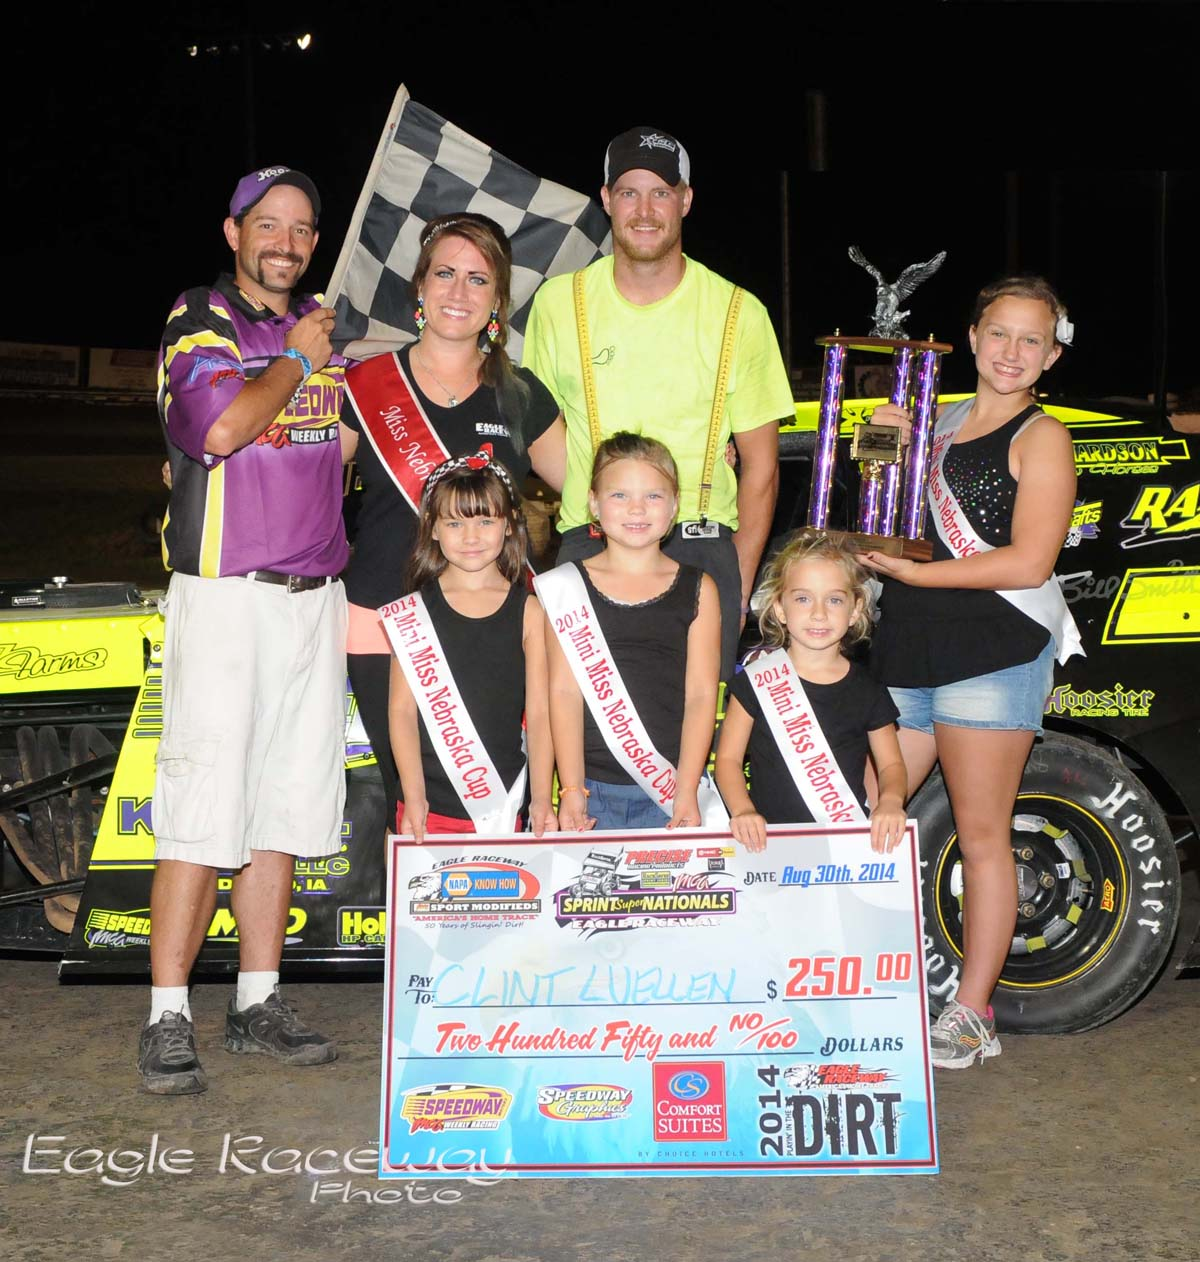 Eagle-08-30-14-442-Clint-Luellen-with-2013-Miss-Nebraska-Cup-Elle-Potocka-along-with-2014-Mini-Miss-Nebraska-Cup-finailist-and-flagman-Billy-Lloyd-JoeOrthPhoto